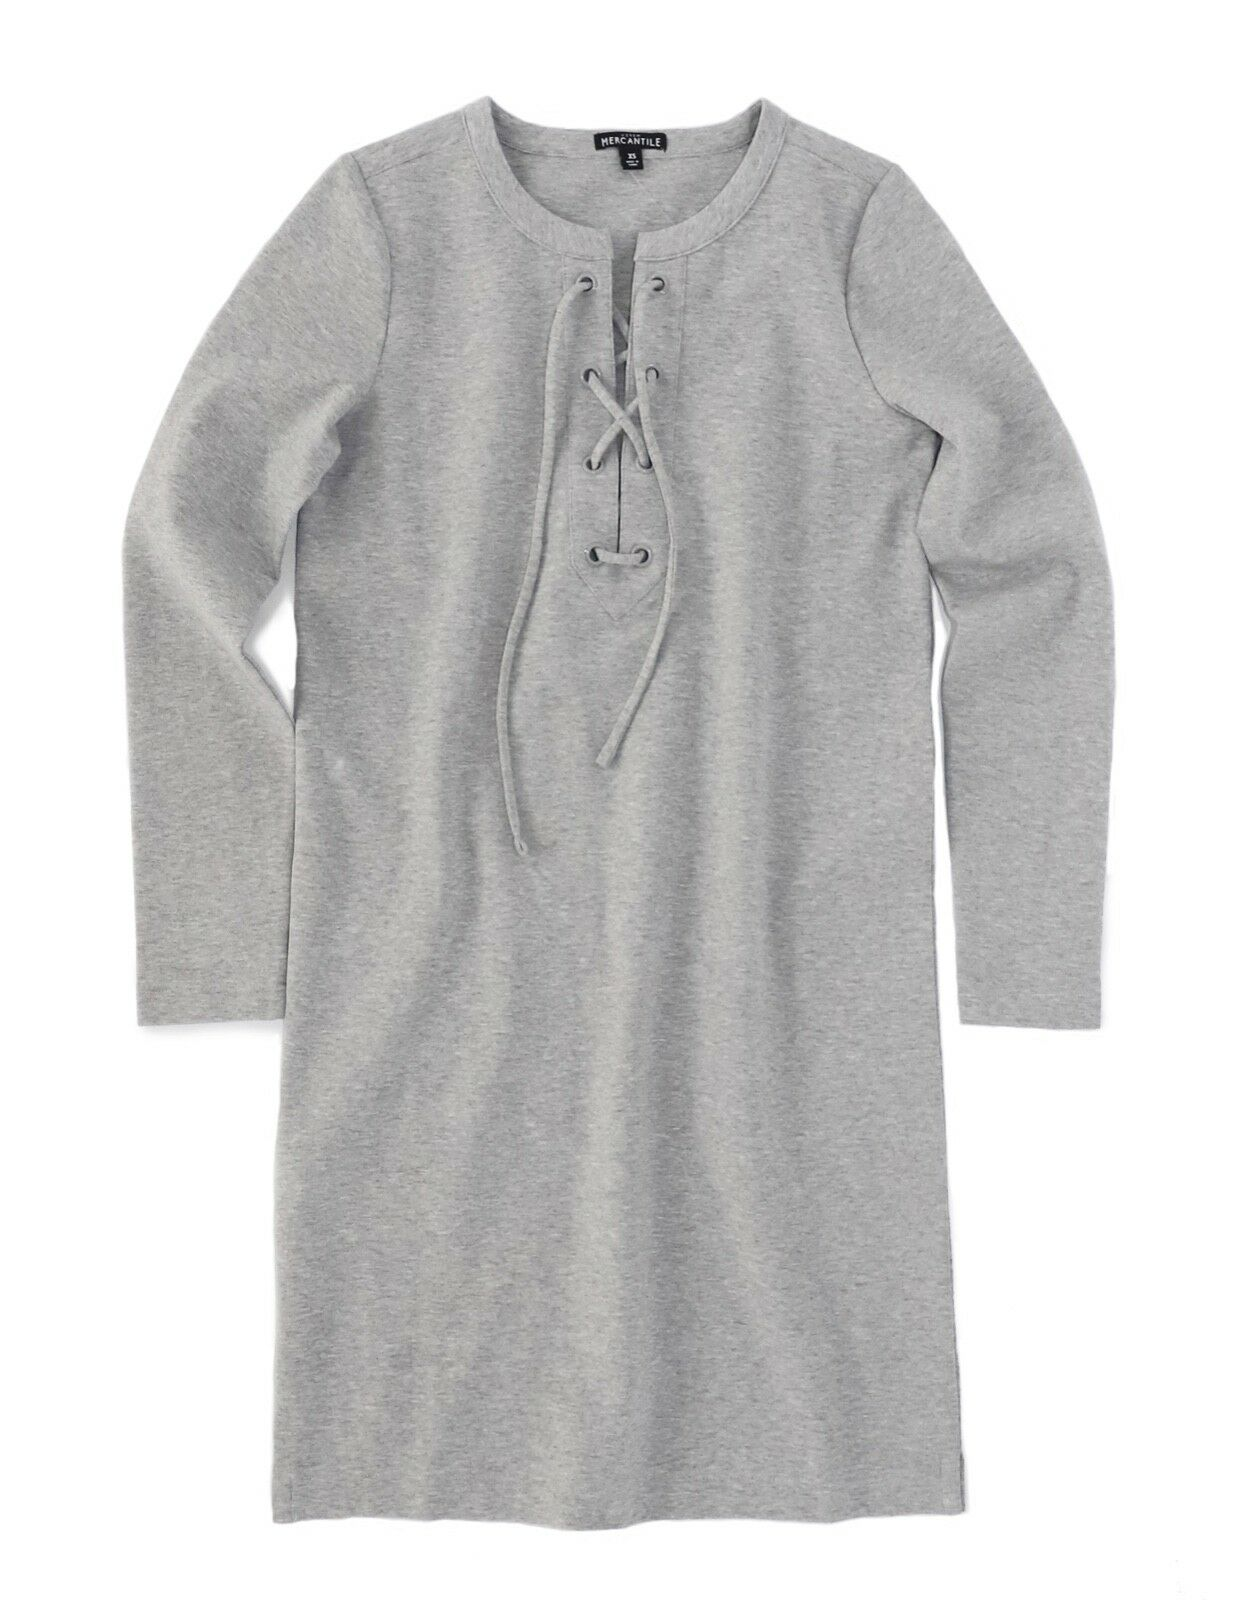 J.Crew Fabrik DAMEN L - Nwt   79 - Grau Melliert Langärmeliges Sweatshirt Kleid